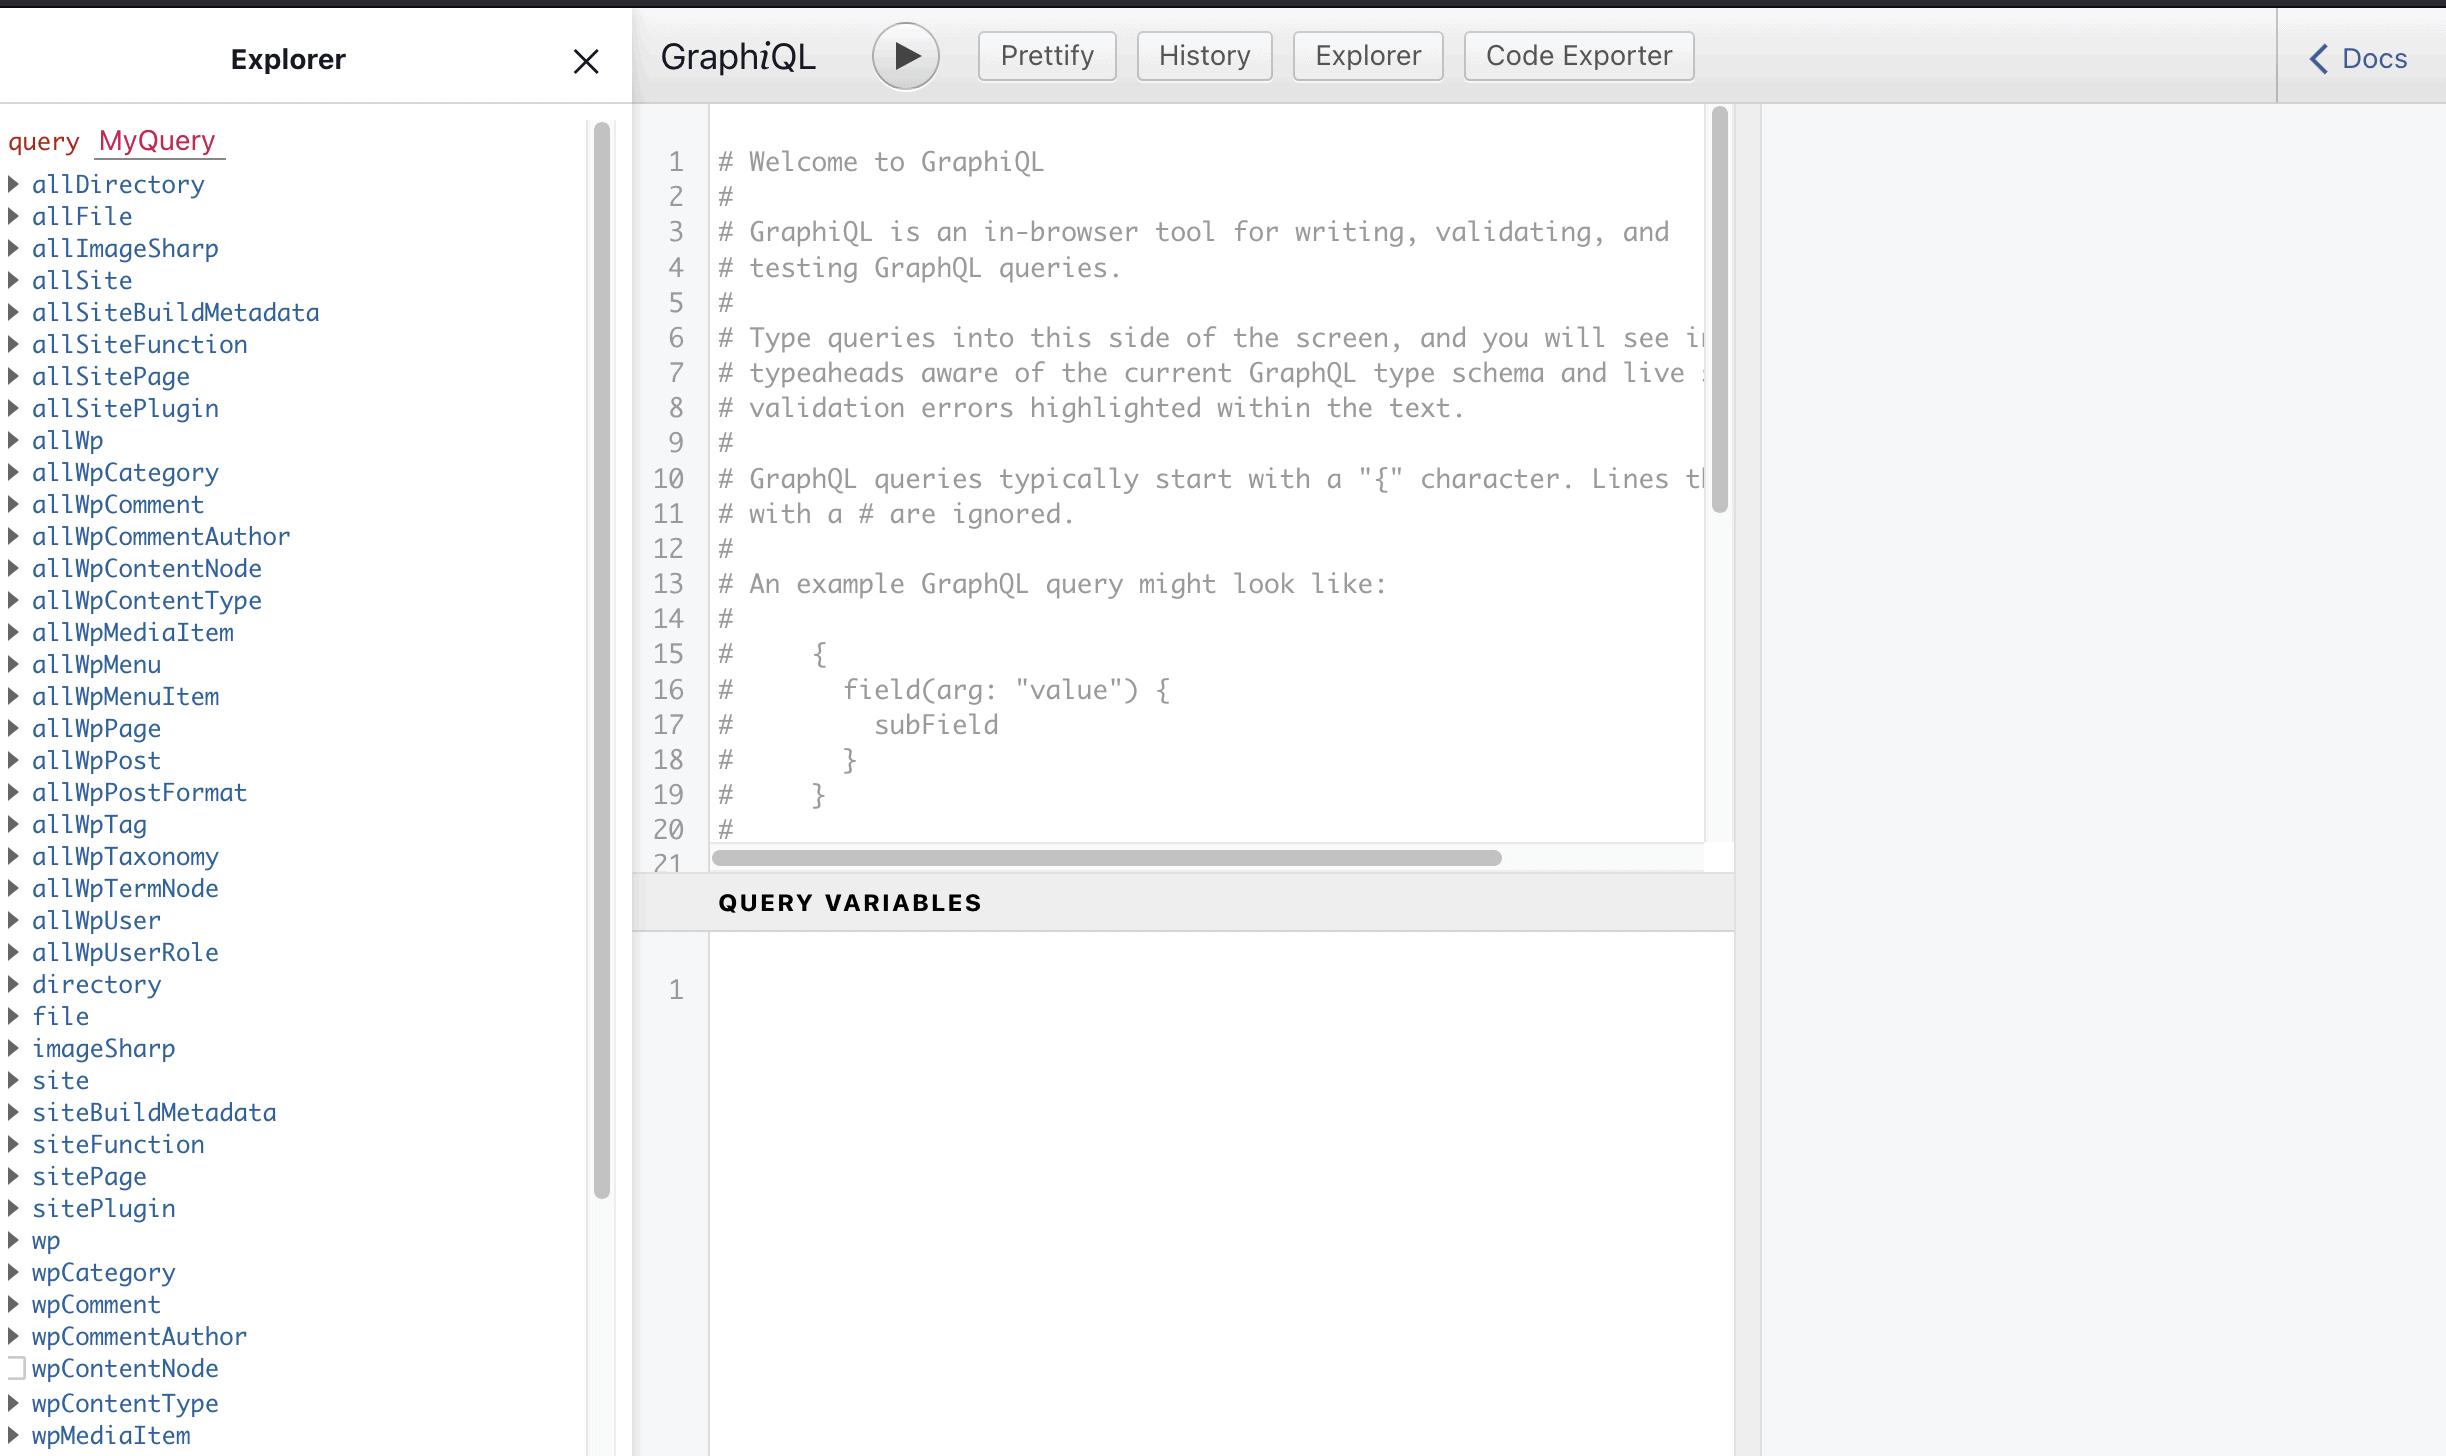 The GraphiQL tool